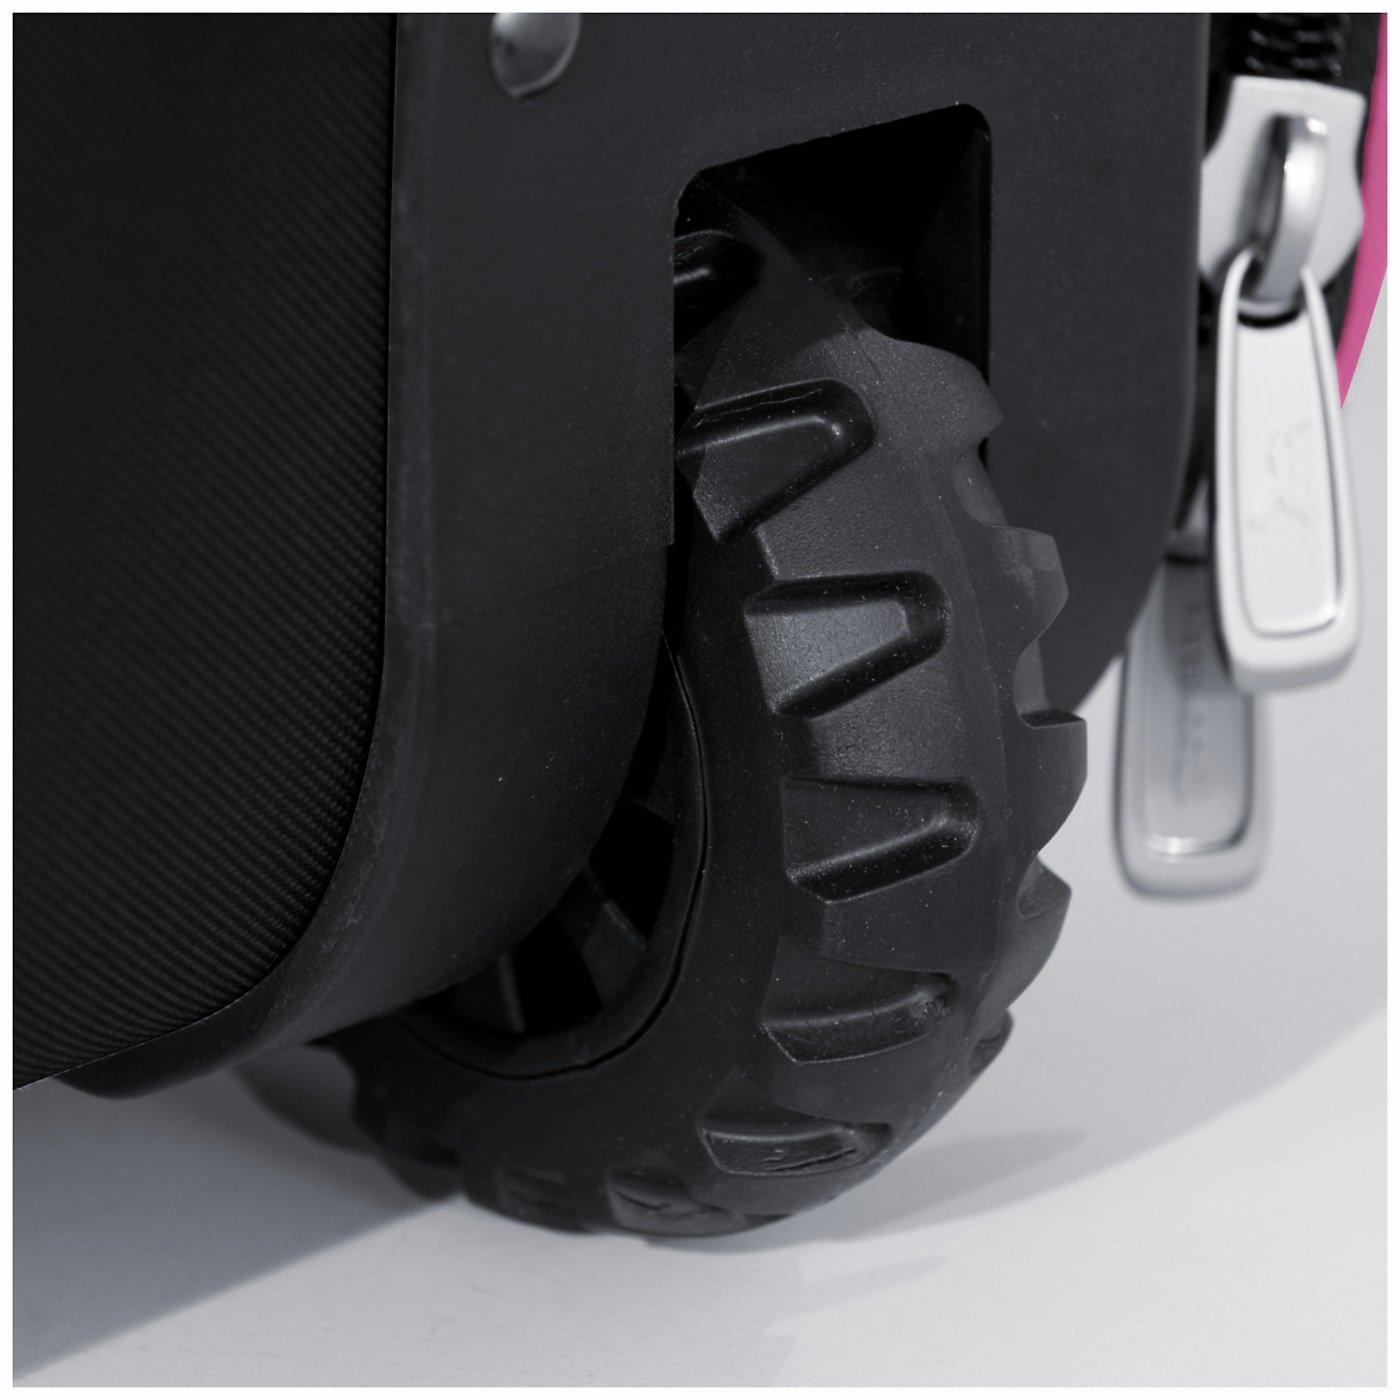 Boombah Beast Baseball/Softball Bat Bag - 40'' x 14'' x 13'' - Black/Pink - Holds 8 Bats, Glove & Shoe Compartments by Boombah (Image #5)